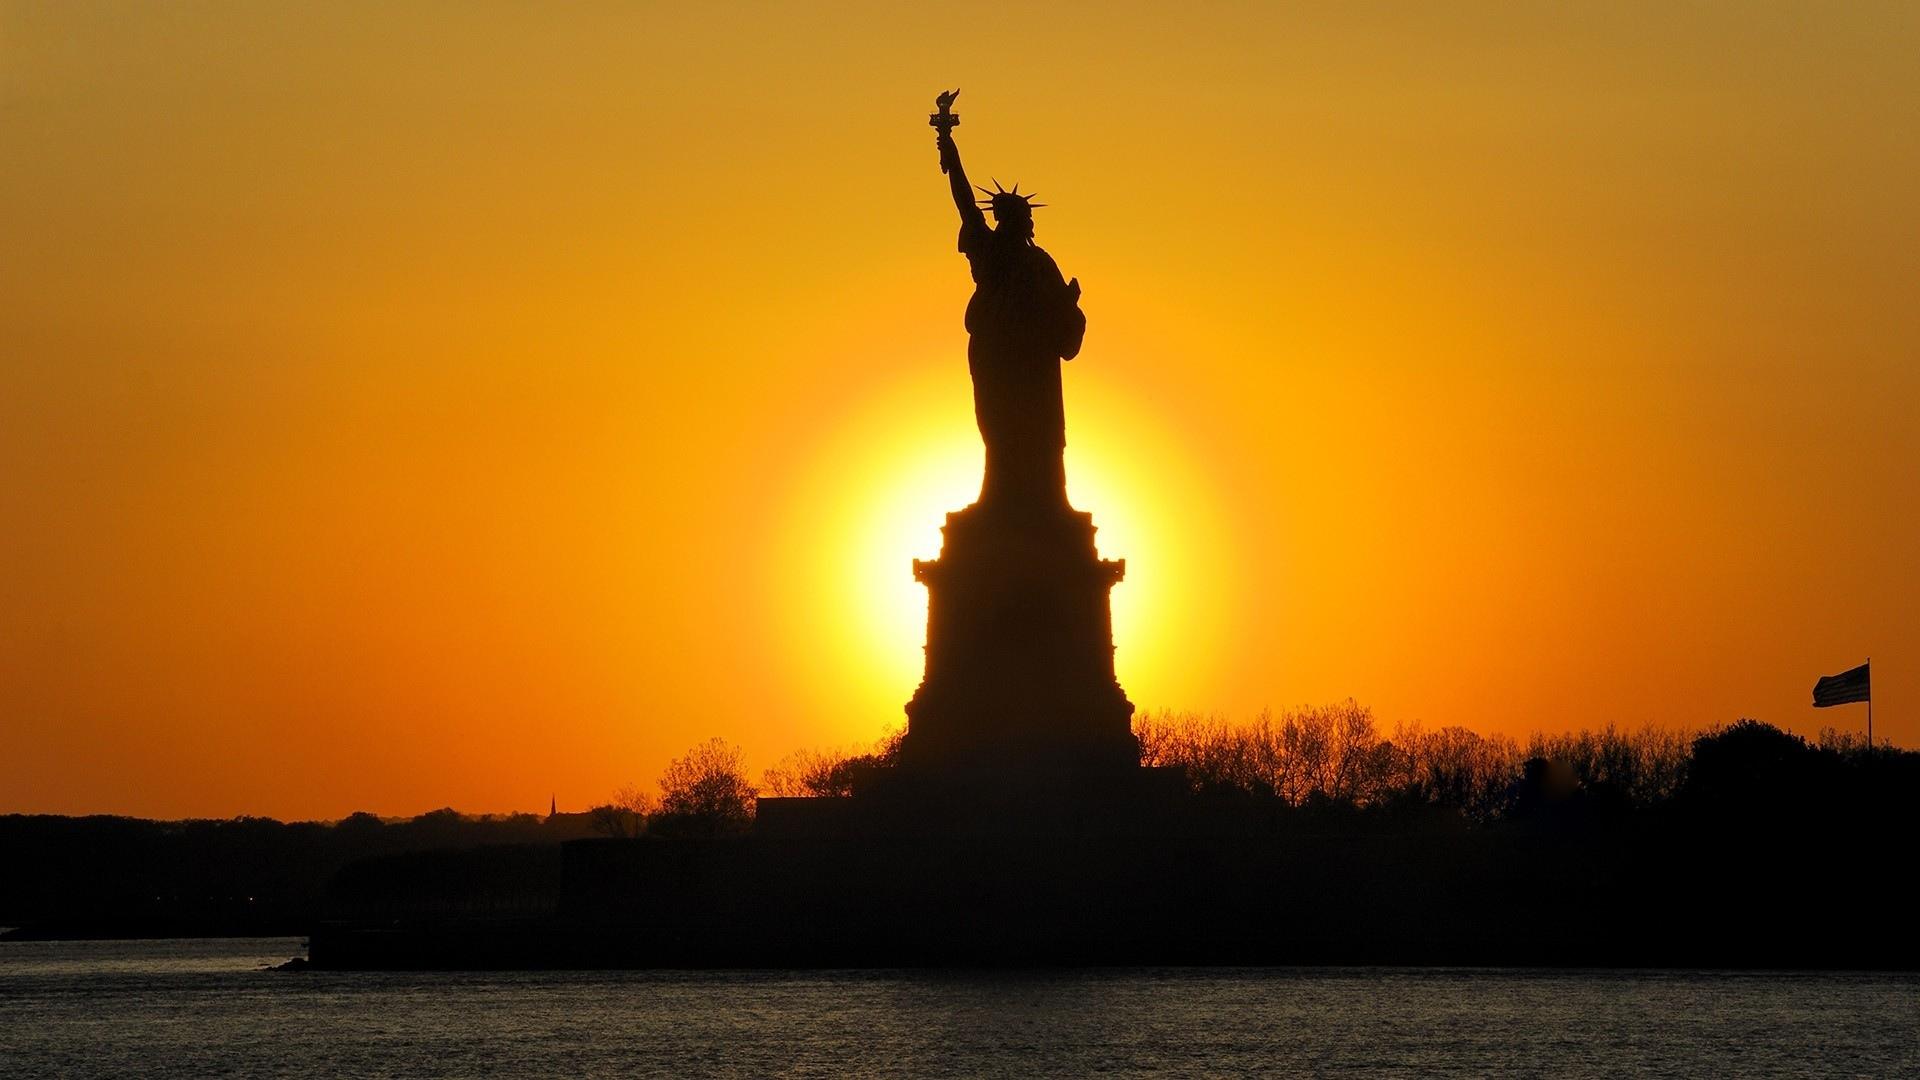 New York City Statue Of Liberty Statue Usa Sunset Sunrise Wallpaper 1920x1080 28766 Wallpaperup